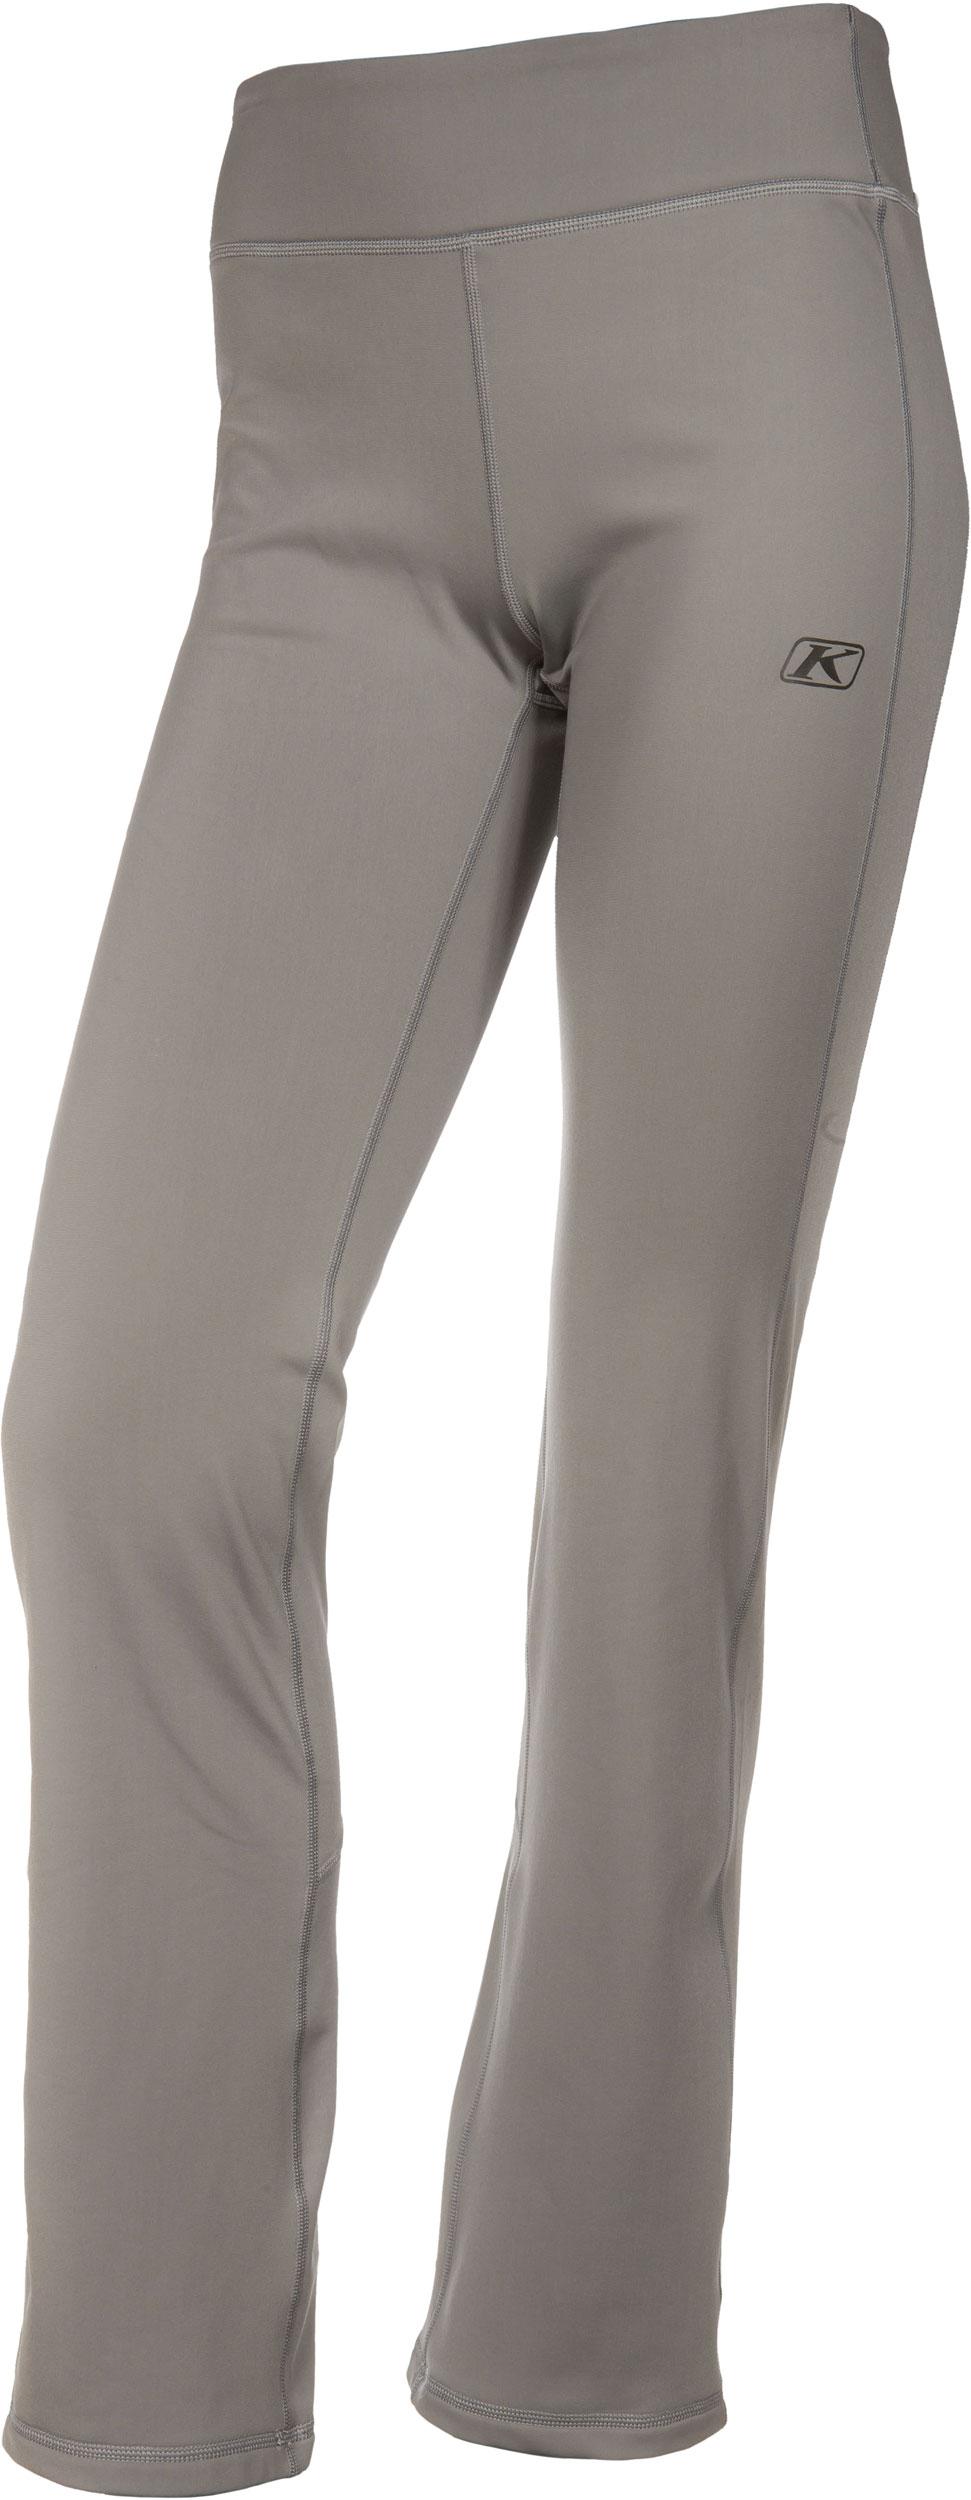 Klim Sundance S16, Textilhose Damen - Grau - L 3147-003-140-600